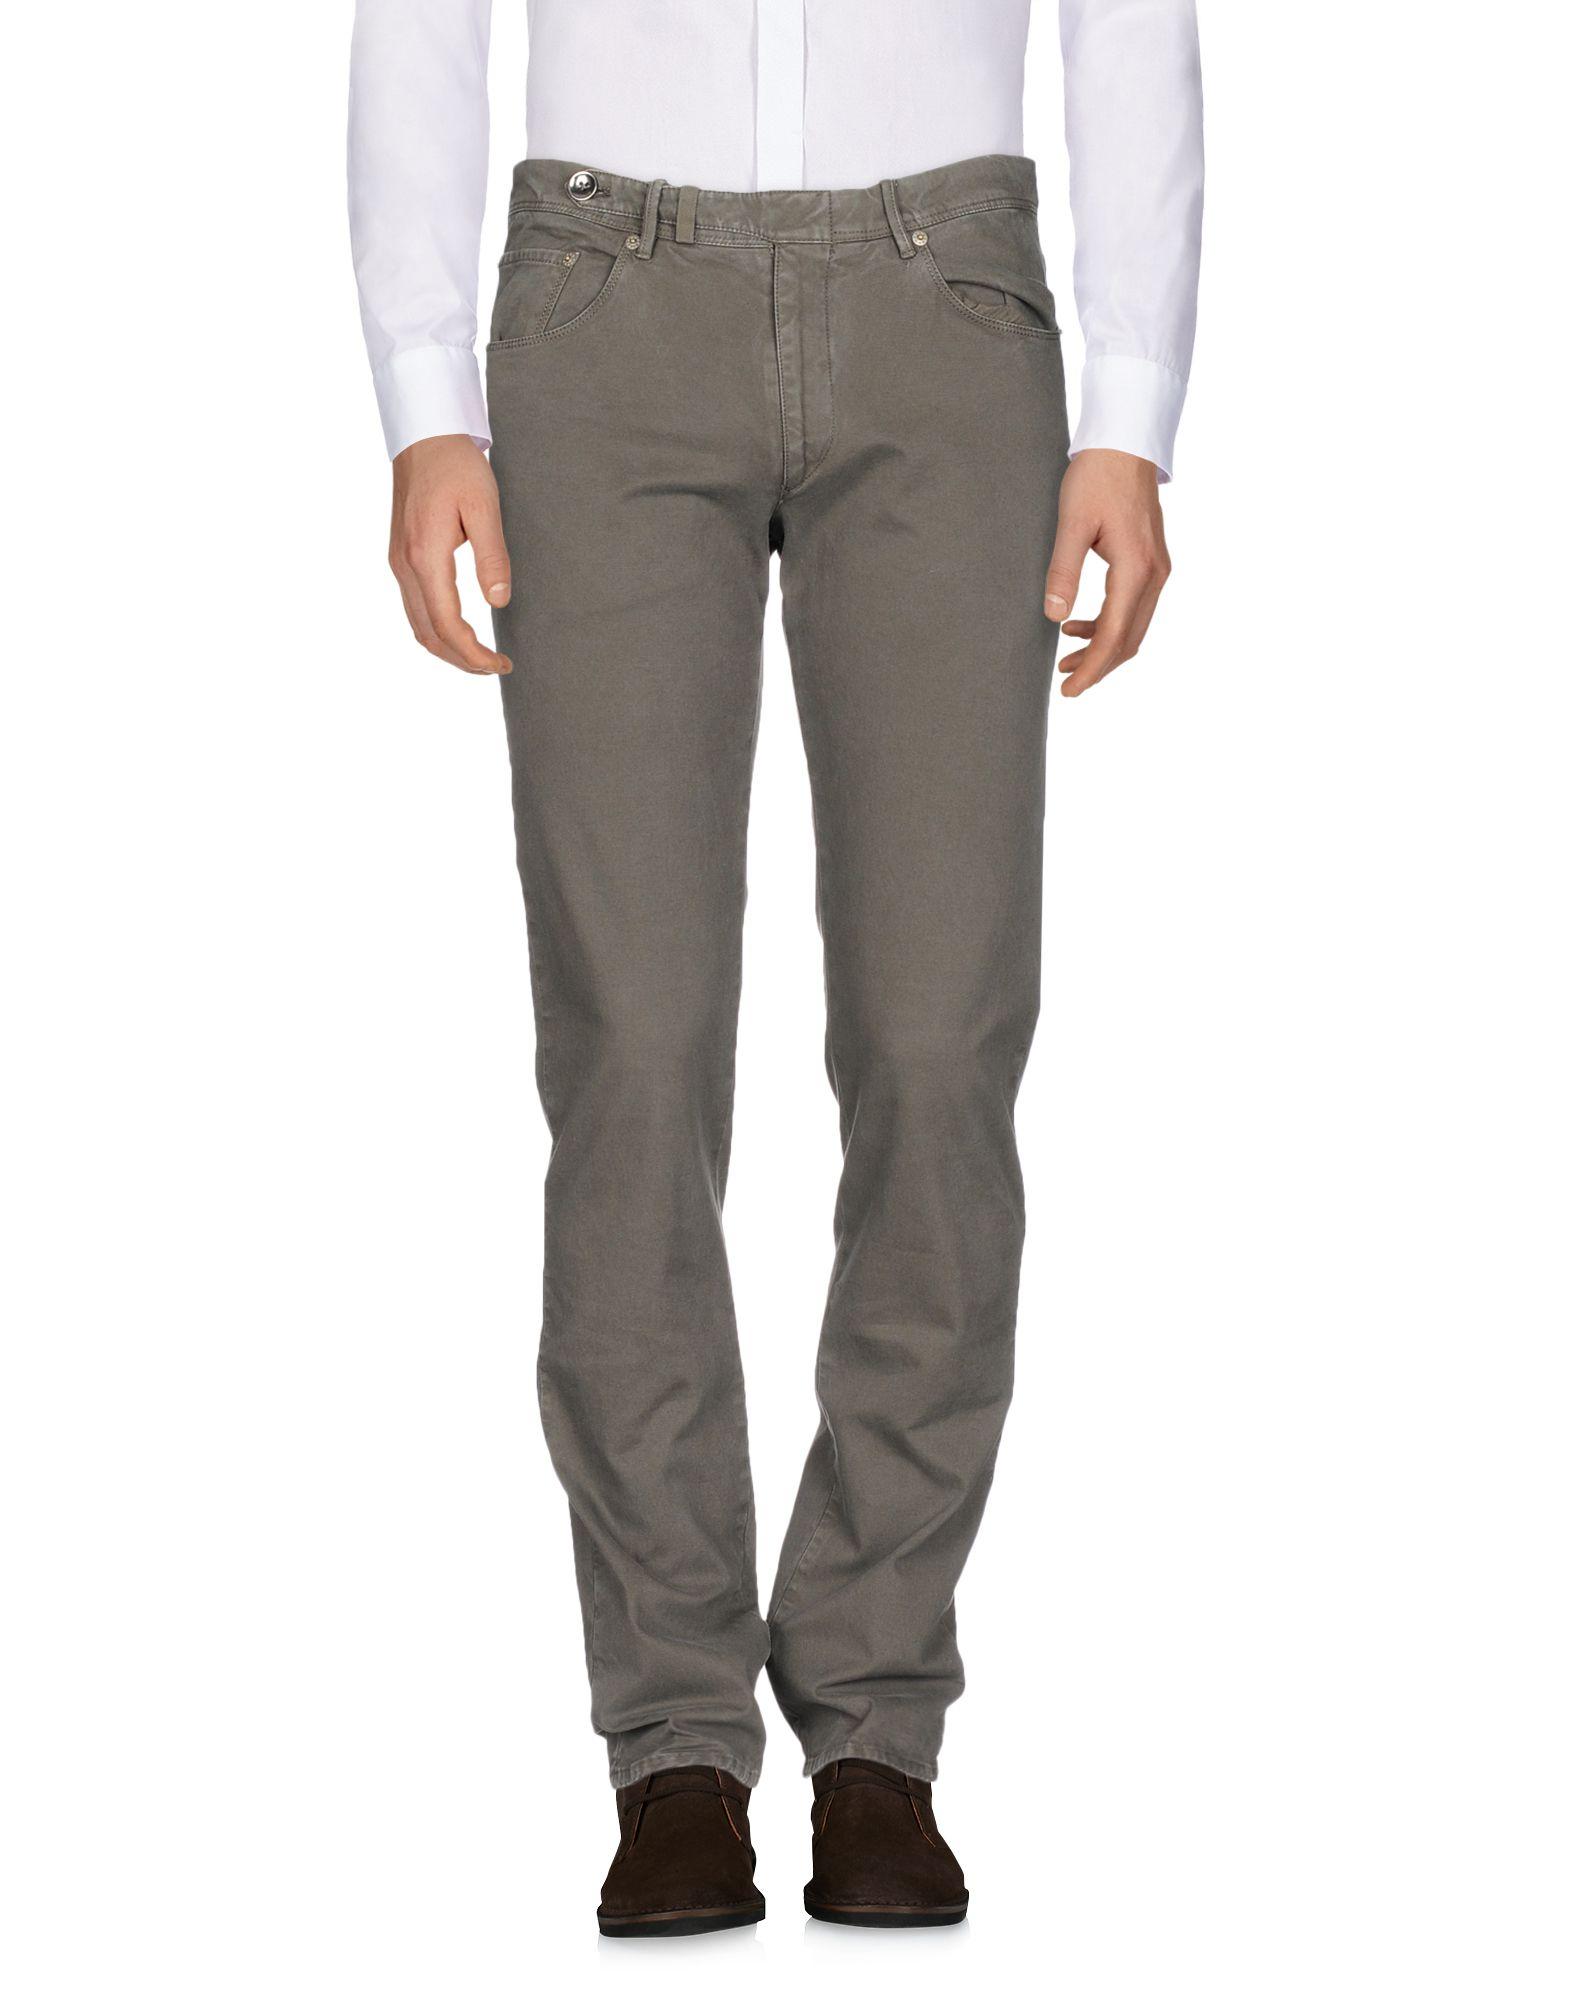 5 Tasche G.T.A. Manifattura Pantaloni Donna - Acquista online su